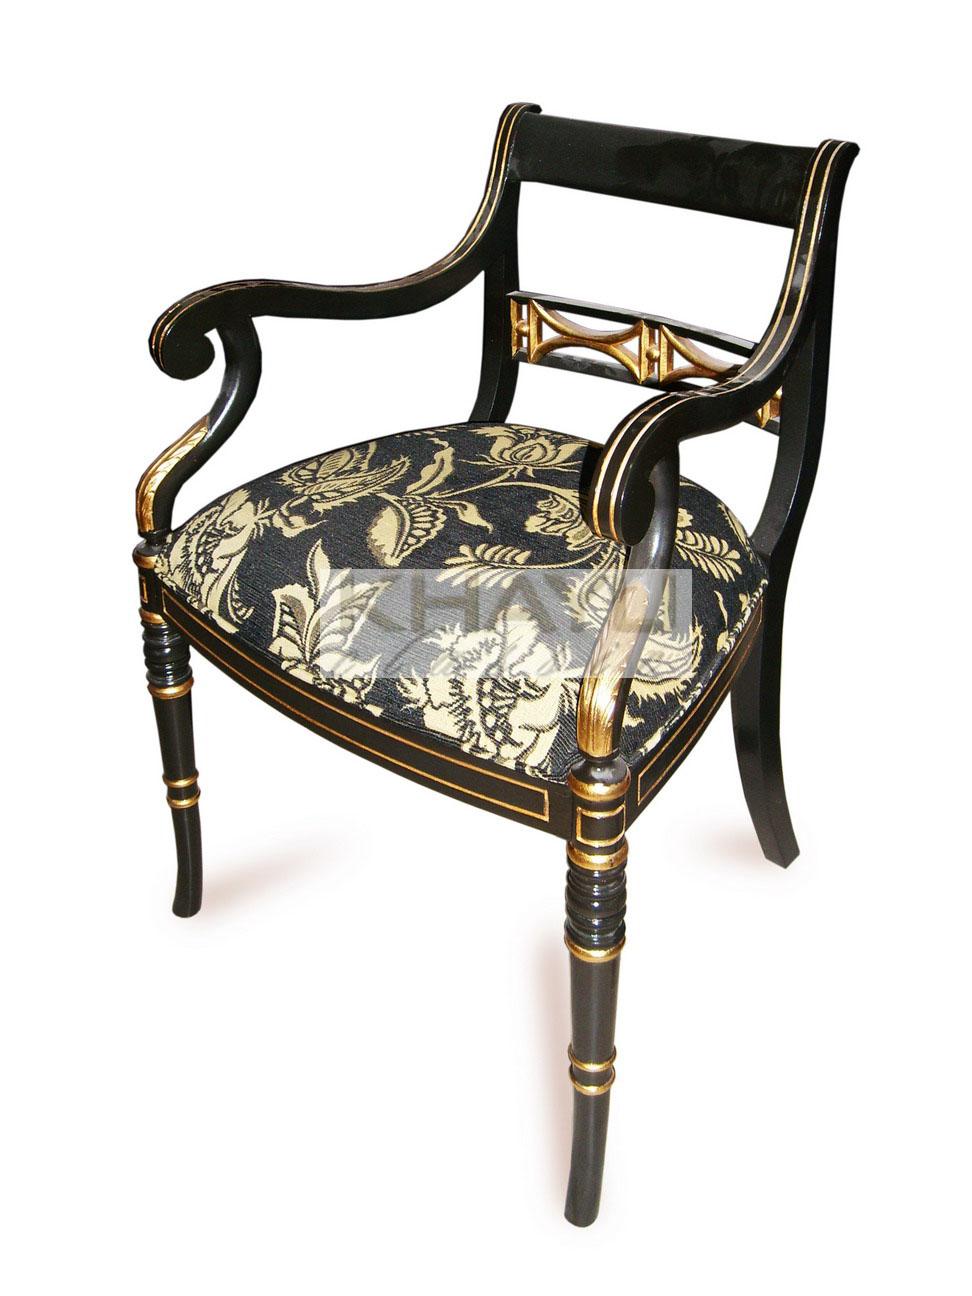 Louis Xiv Reproduction Furniture Khayu Classic Indonesia